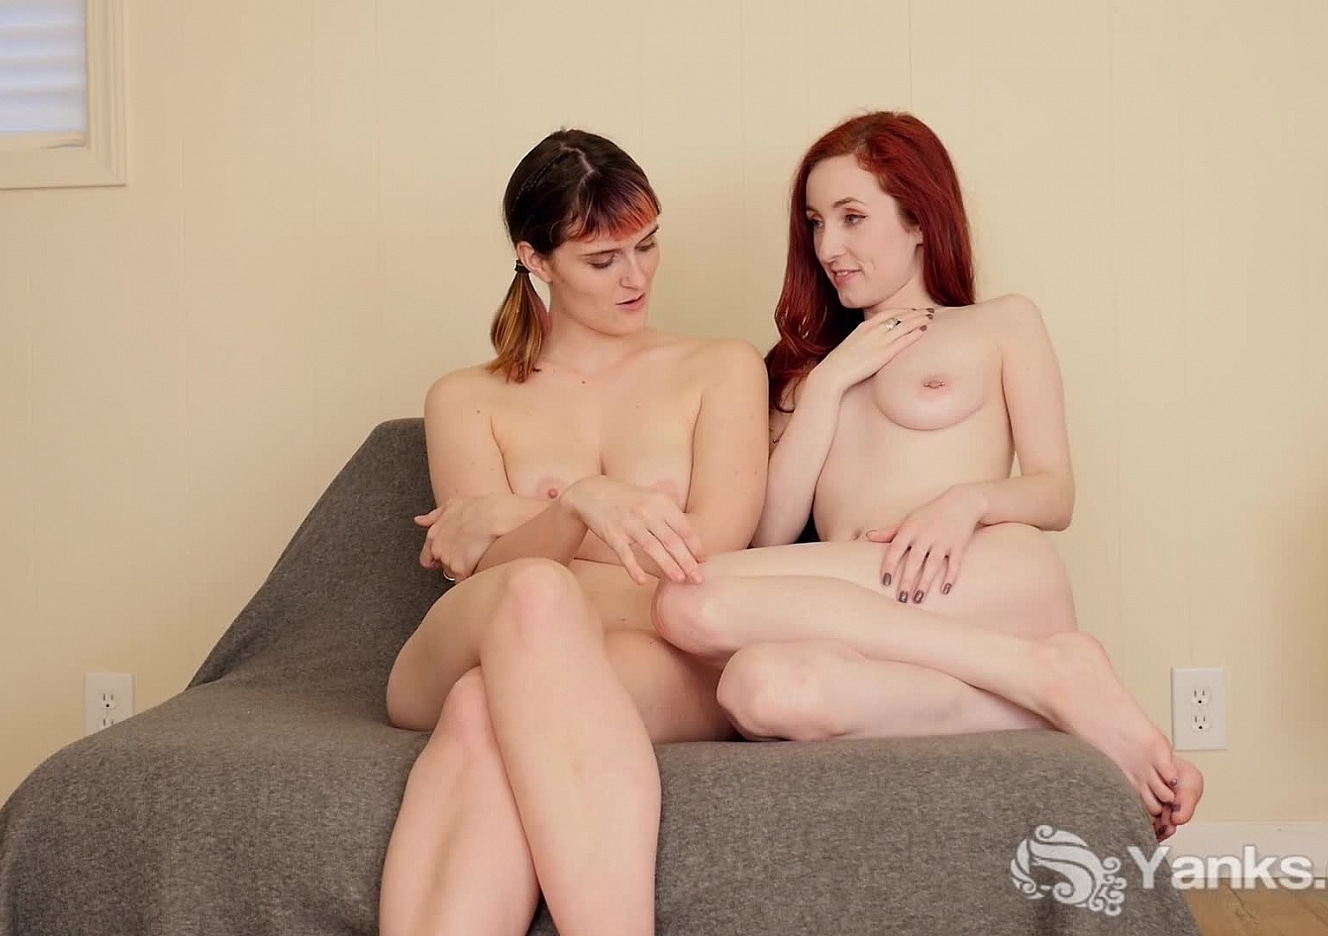 /content/penny_lay_and_sosha_belle/bonus4/0.jpg